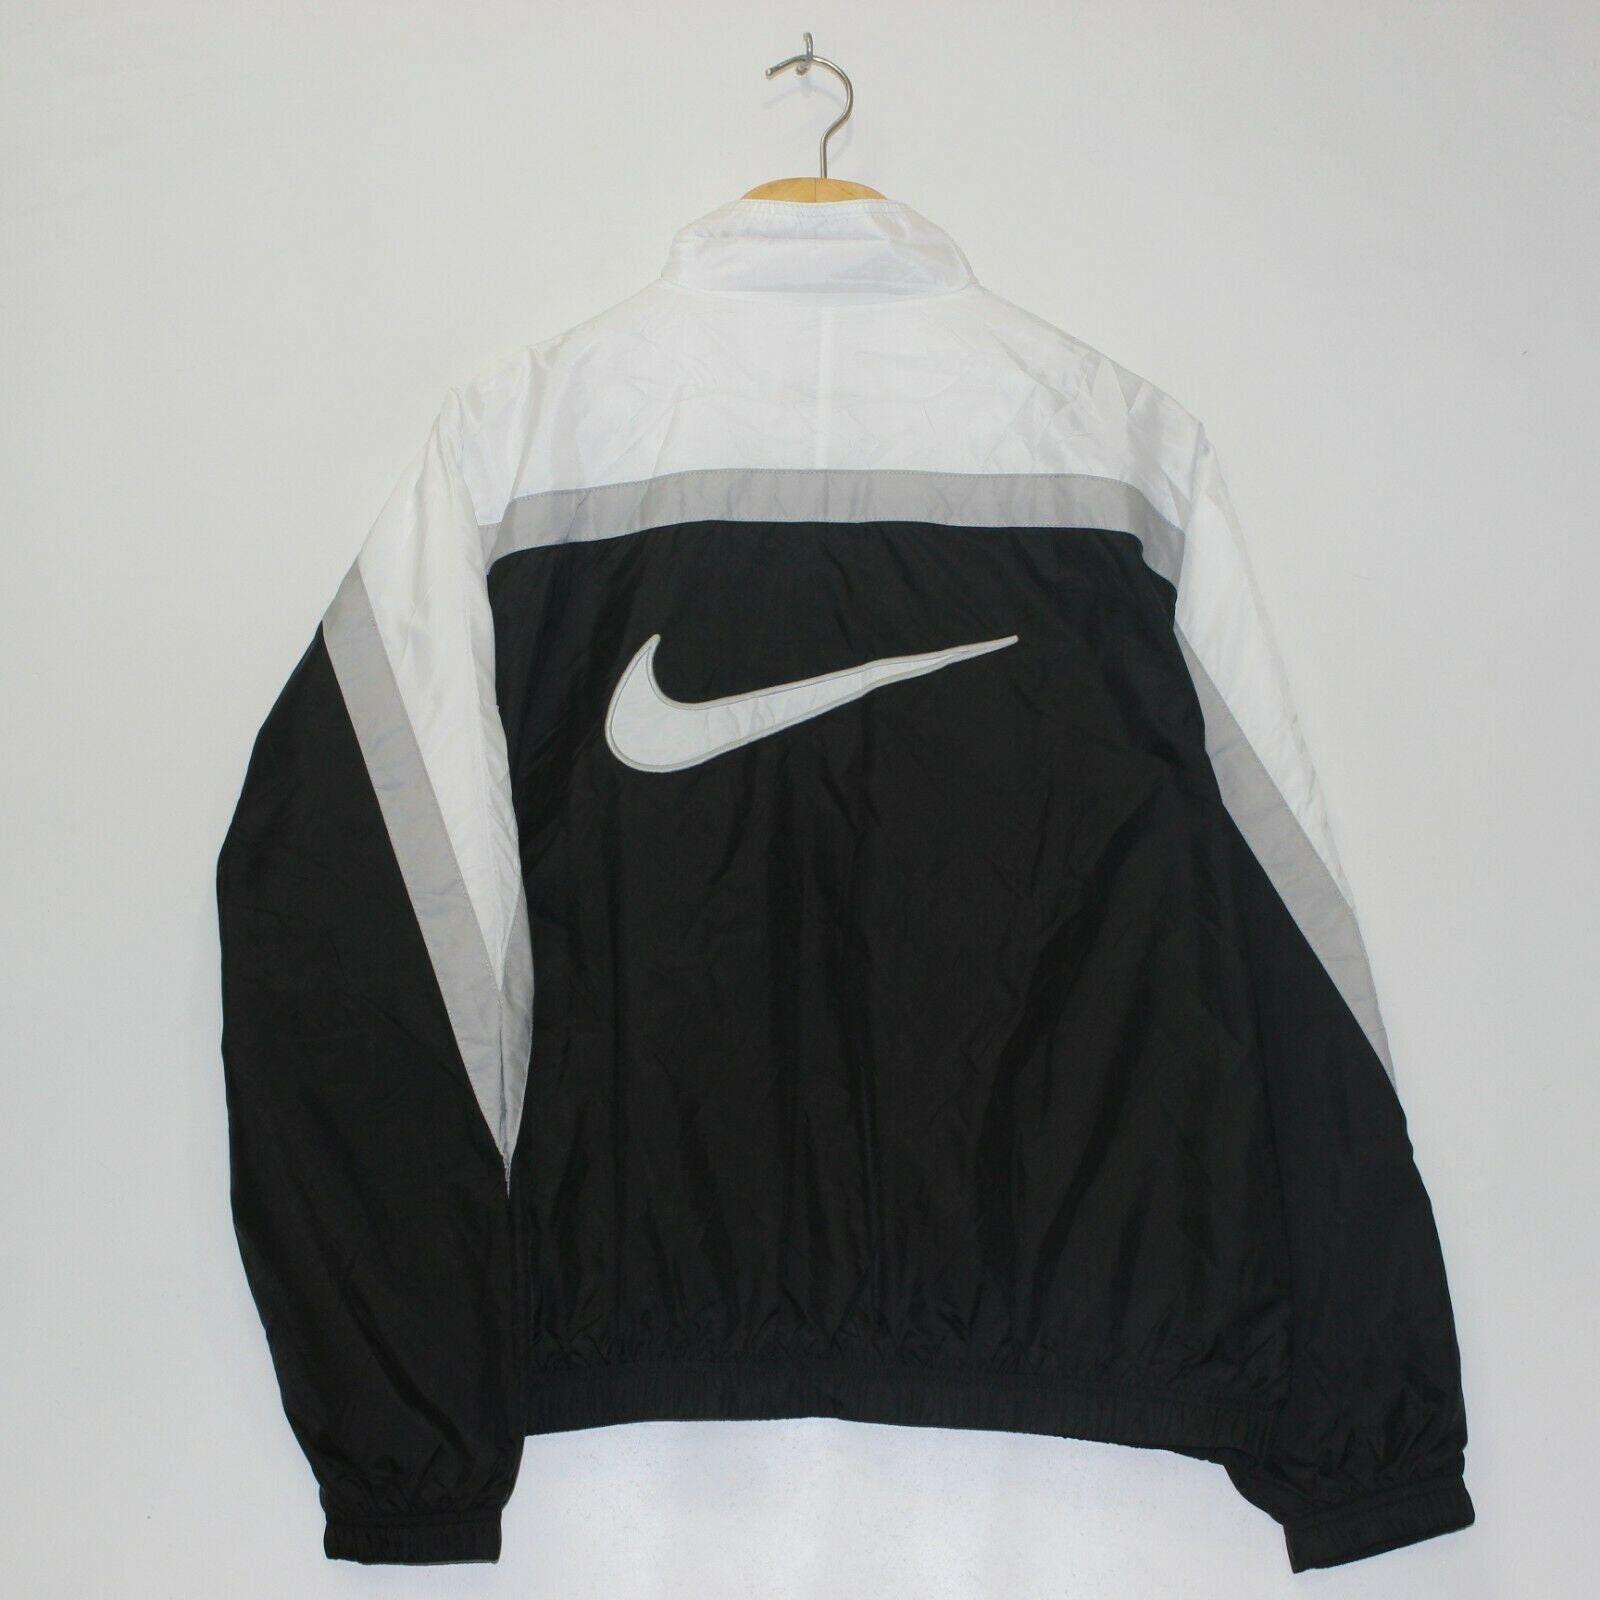 Vintage adidas Windbreaker Jacket Youth Size L 14 16 Blue White Stripe